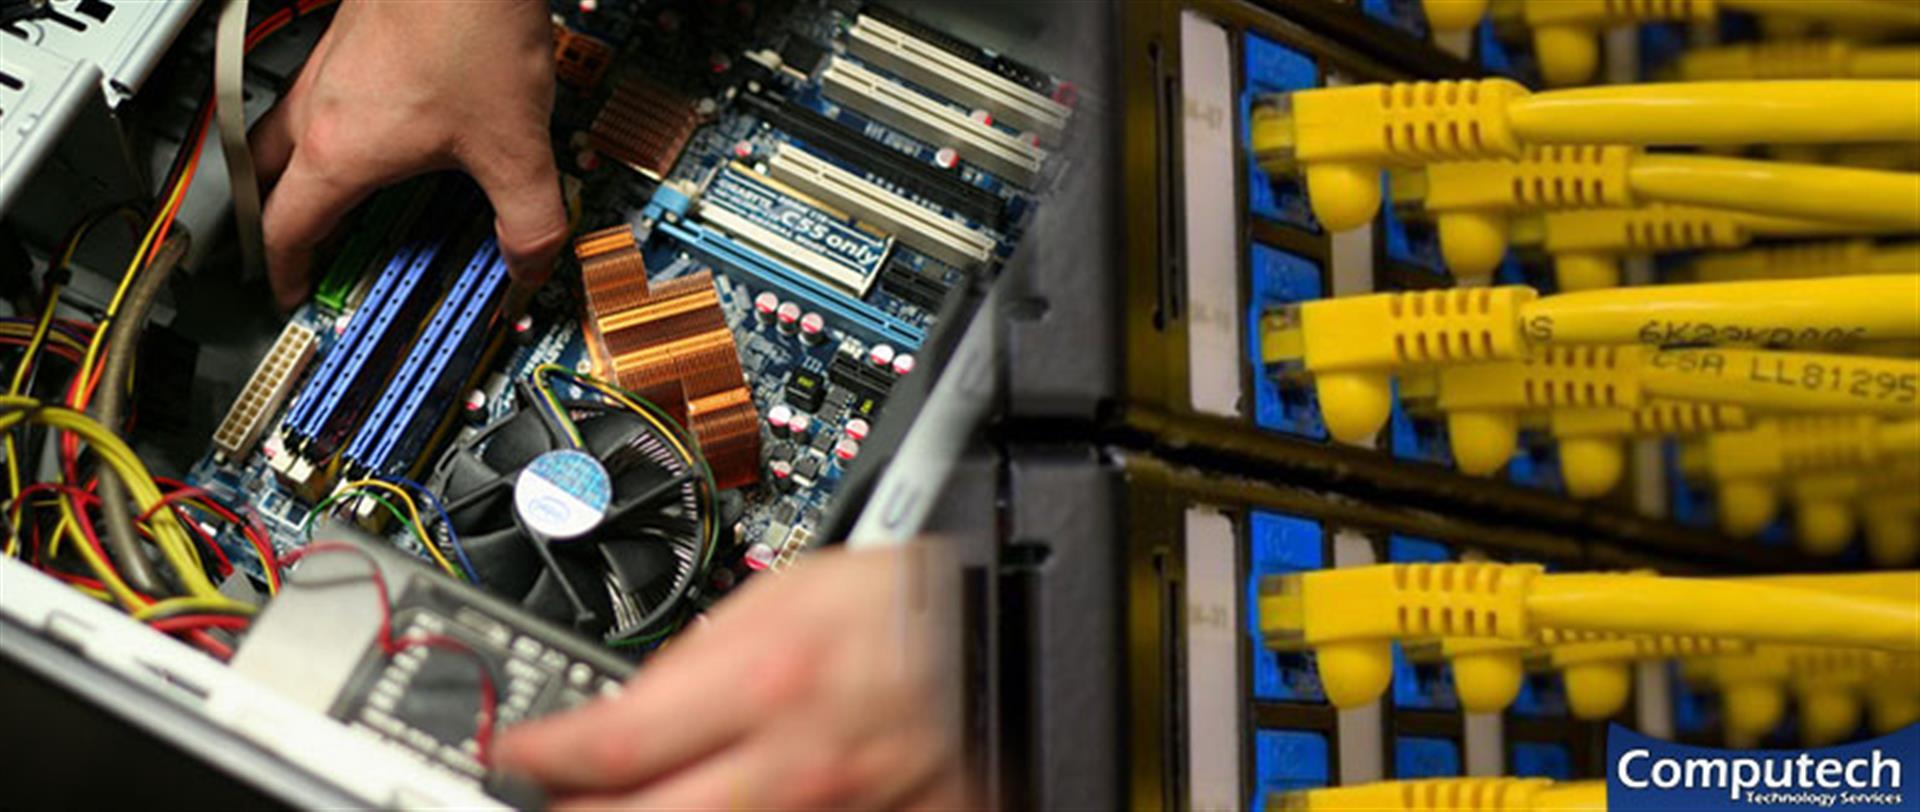 Dahlonega Georgia On Site Computer PC & Printer Repairs, Networks, Voice & Data Cabling Solutions